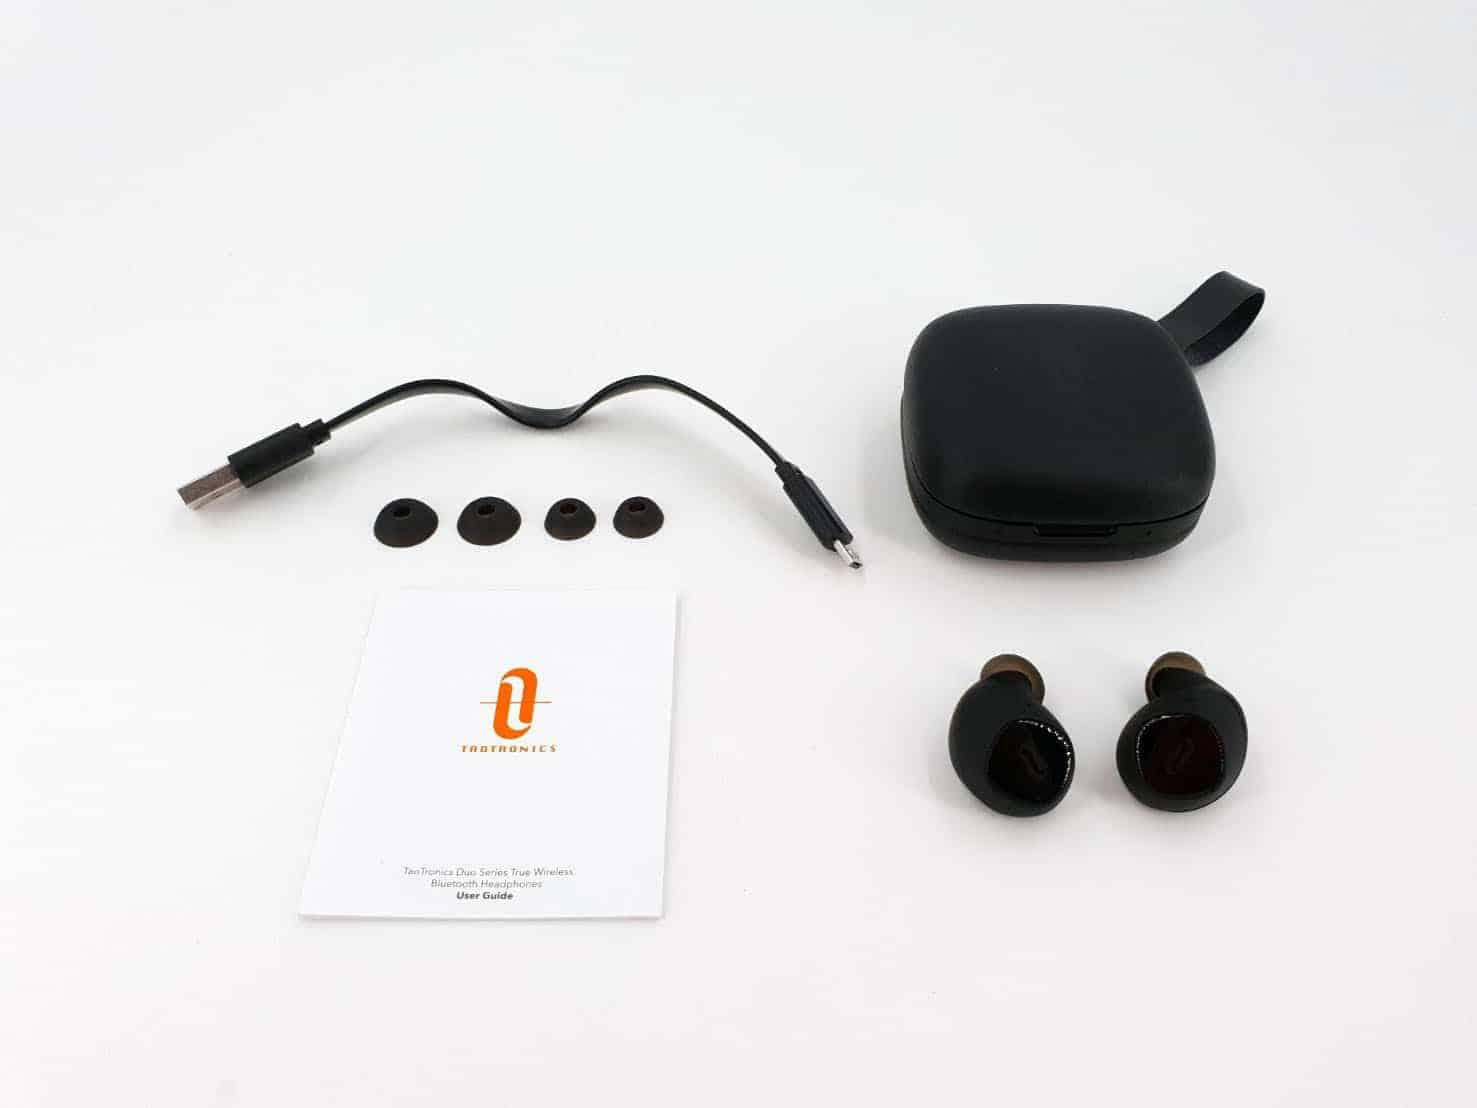 TaoTroncis Duo Free平價真無線耳機推薦 內容物